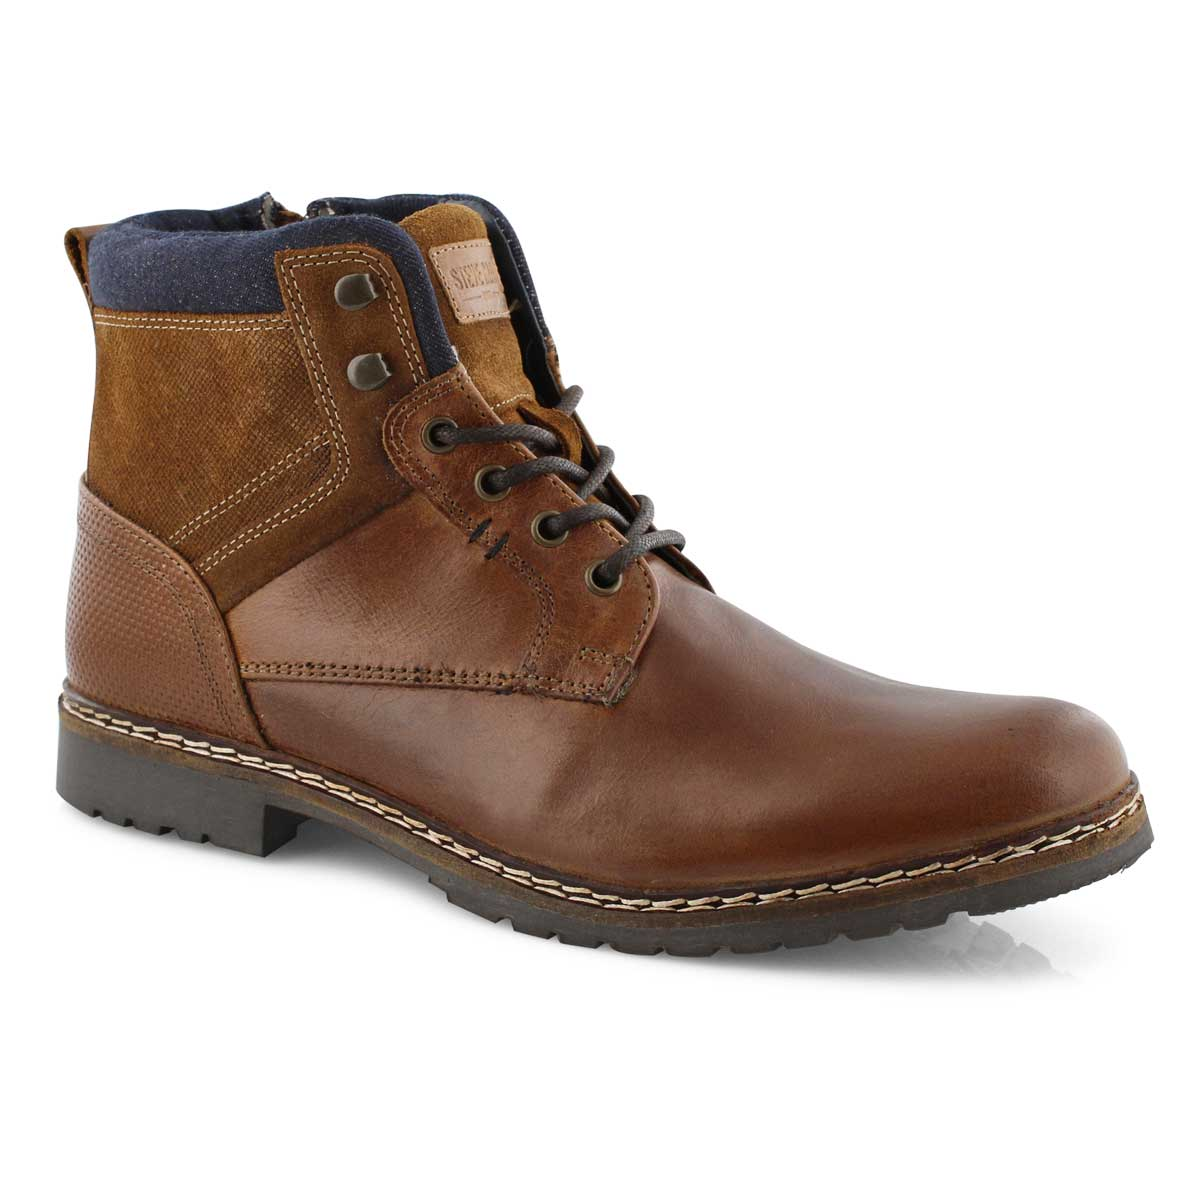 Mns Wranglerr cognac lace up ankle boot